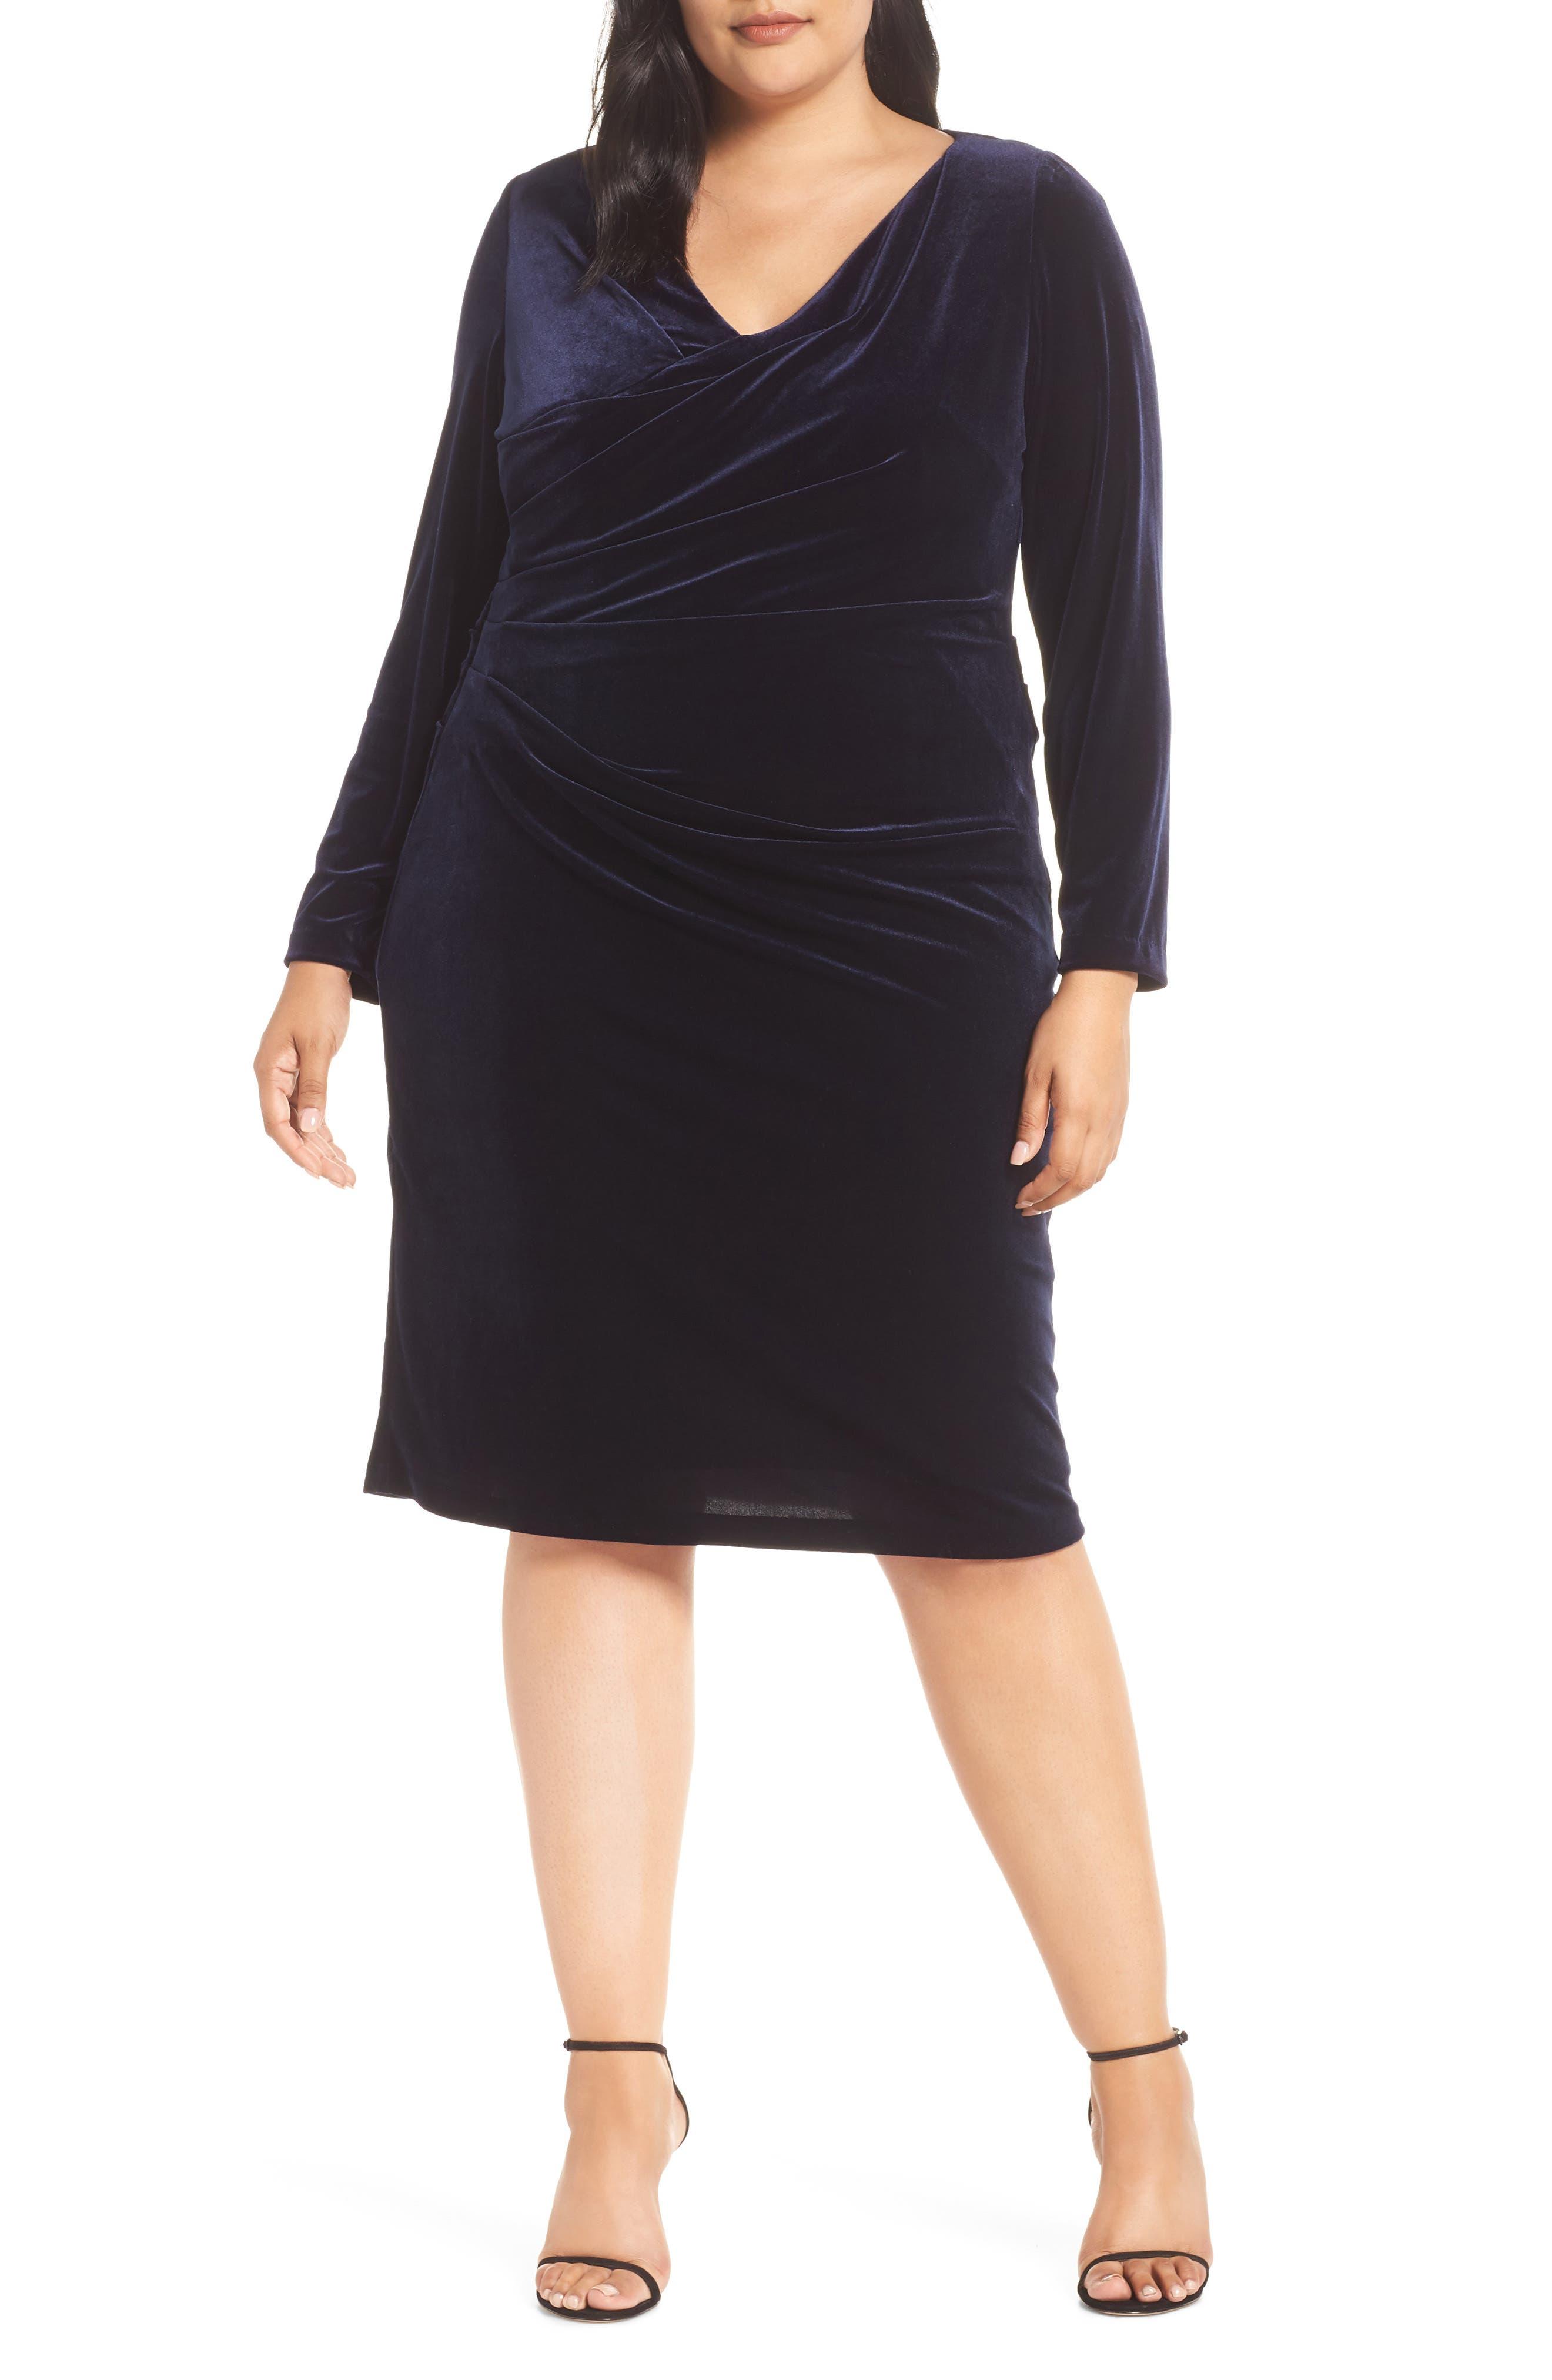 VINCE CAMUTO, Midi Dress, Main thumbnail 1, color, 410